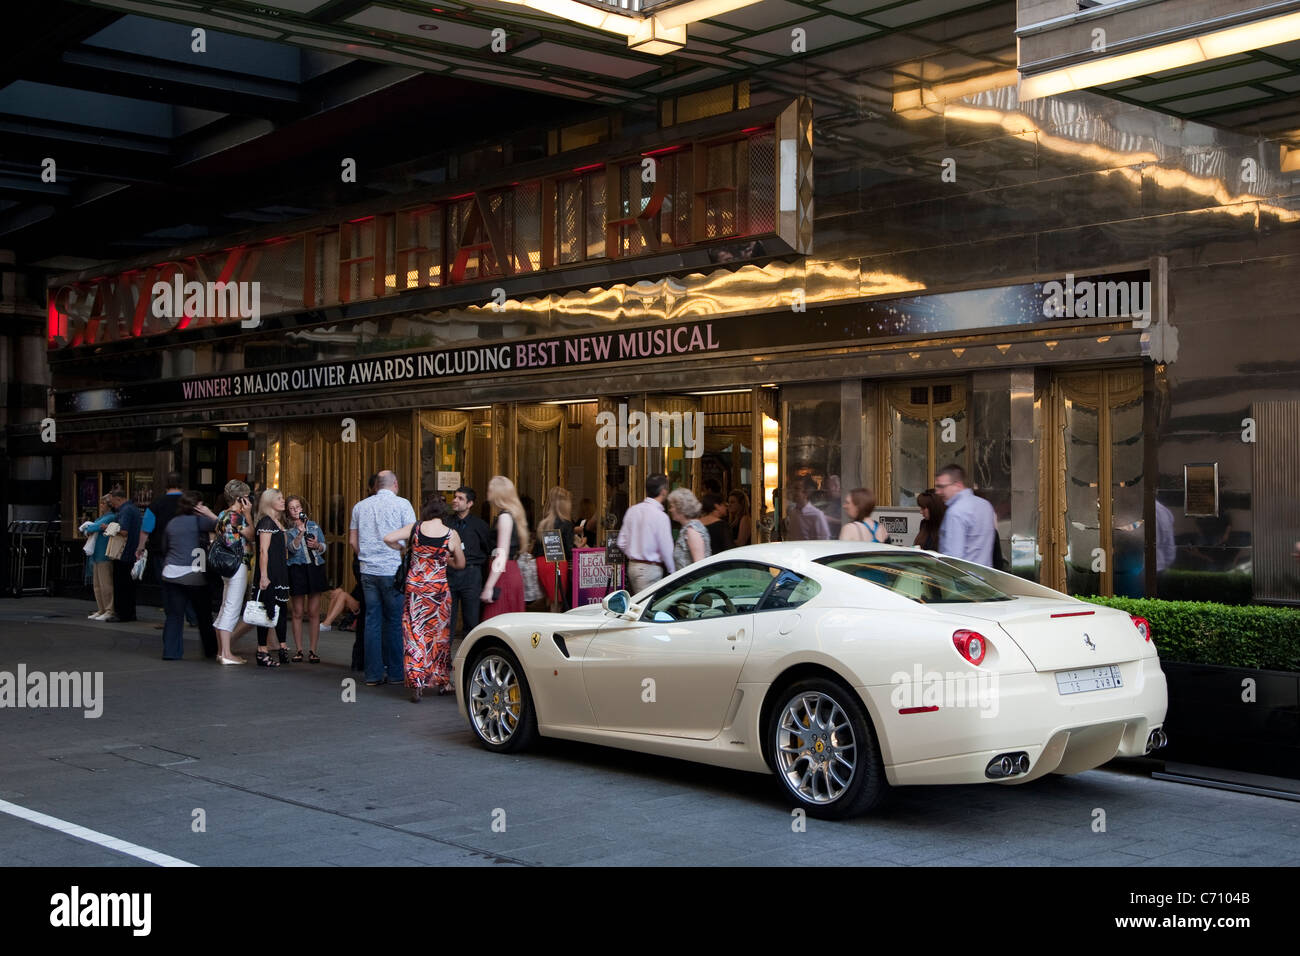 Savoy Theatre with a Ferrari Car; London, England, UK - Stock Image